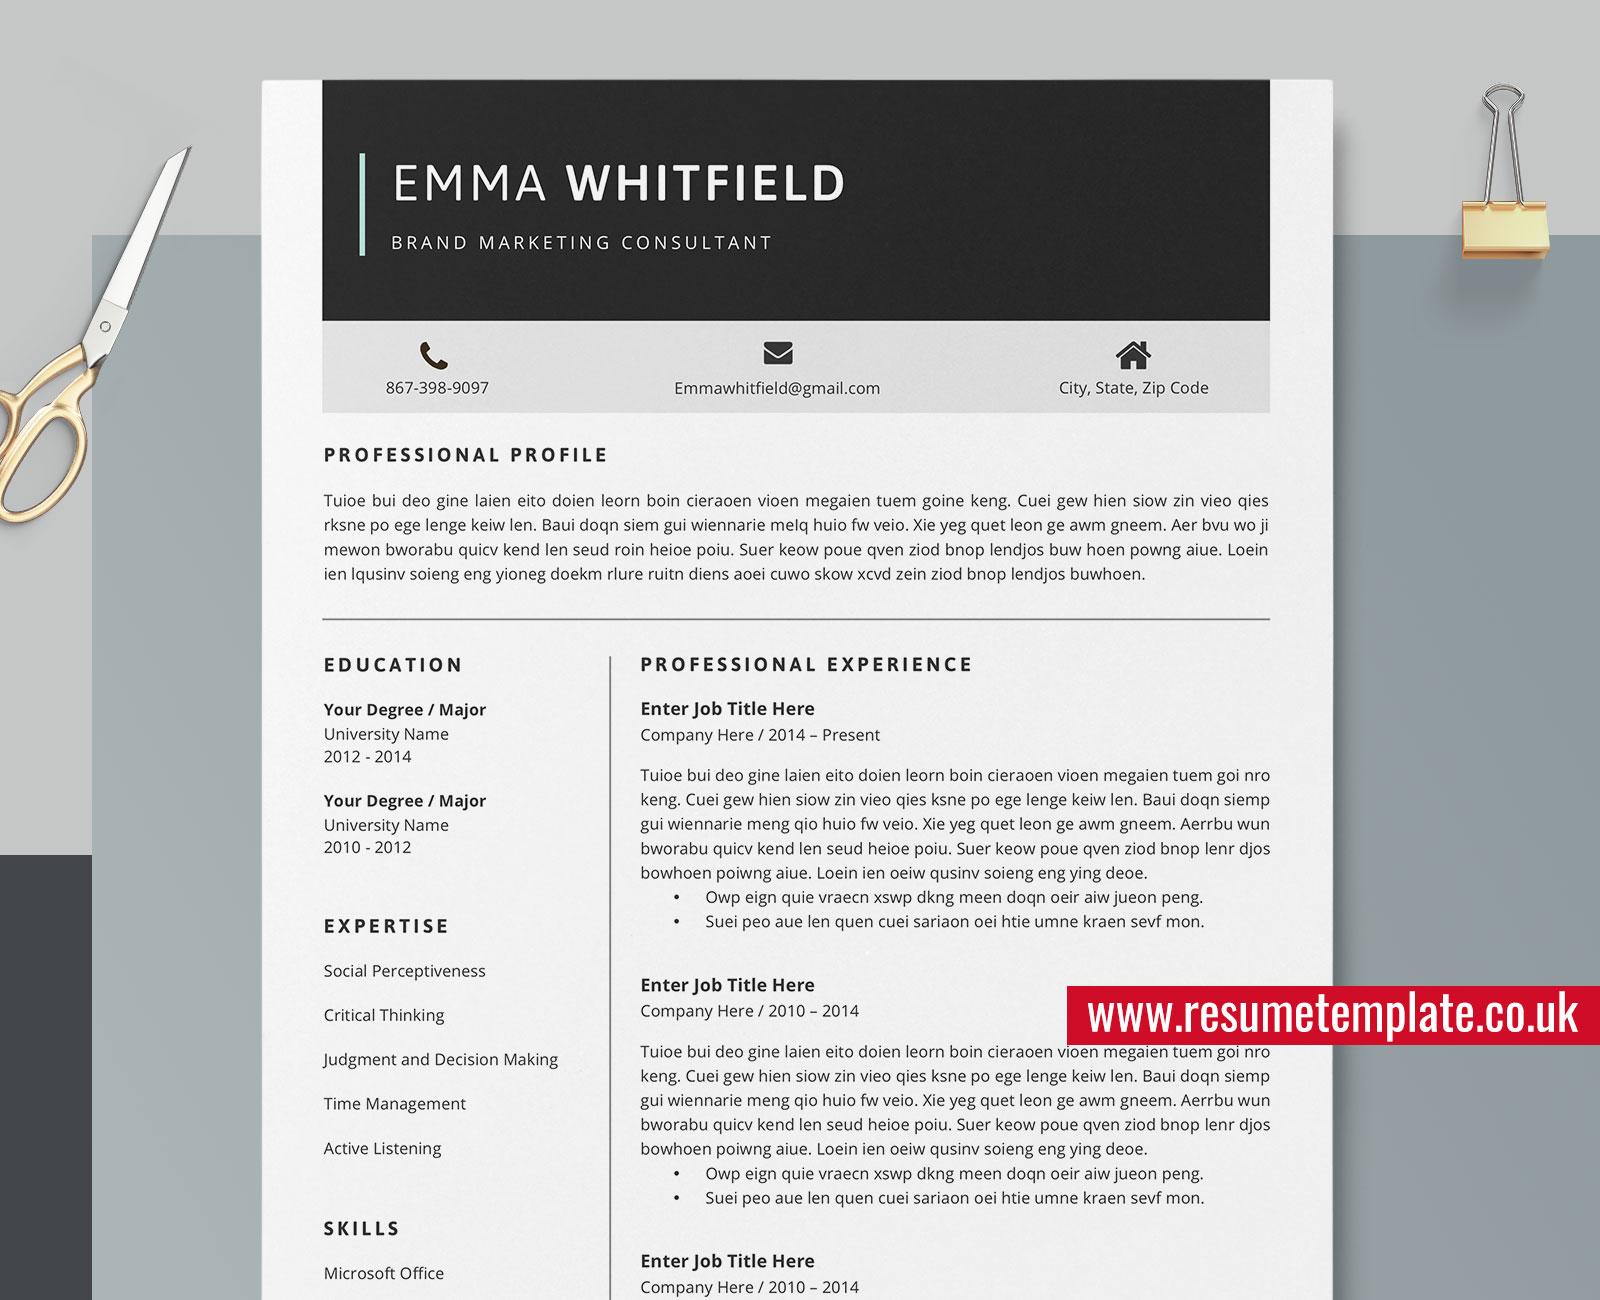 Microsoft Word Cv Template from www.resumetemplate.co.uk